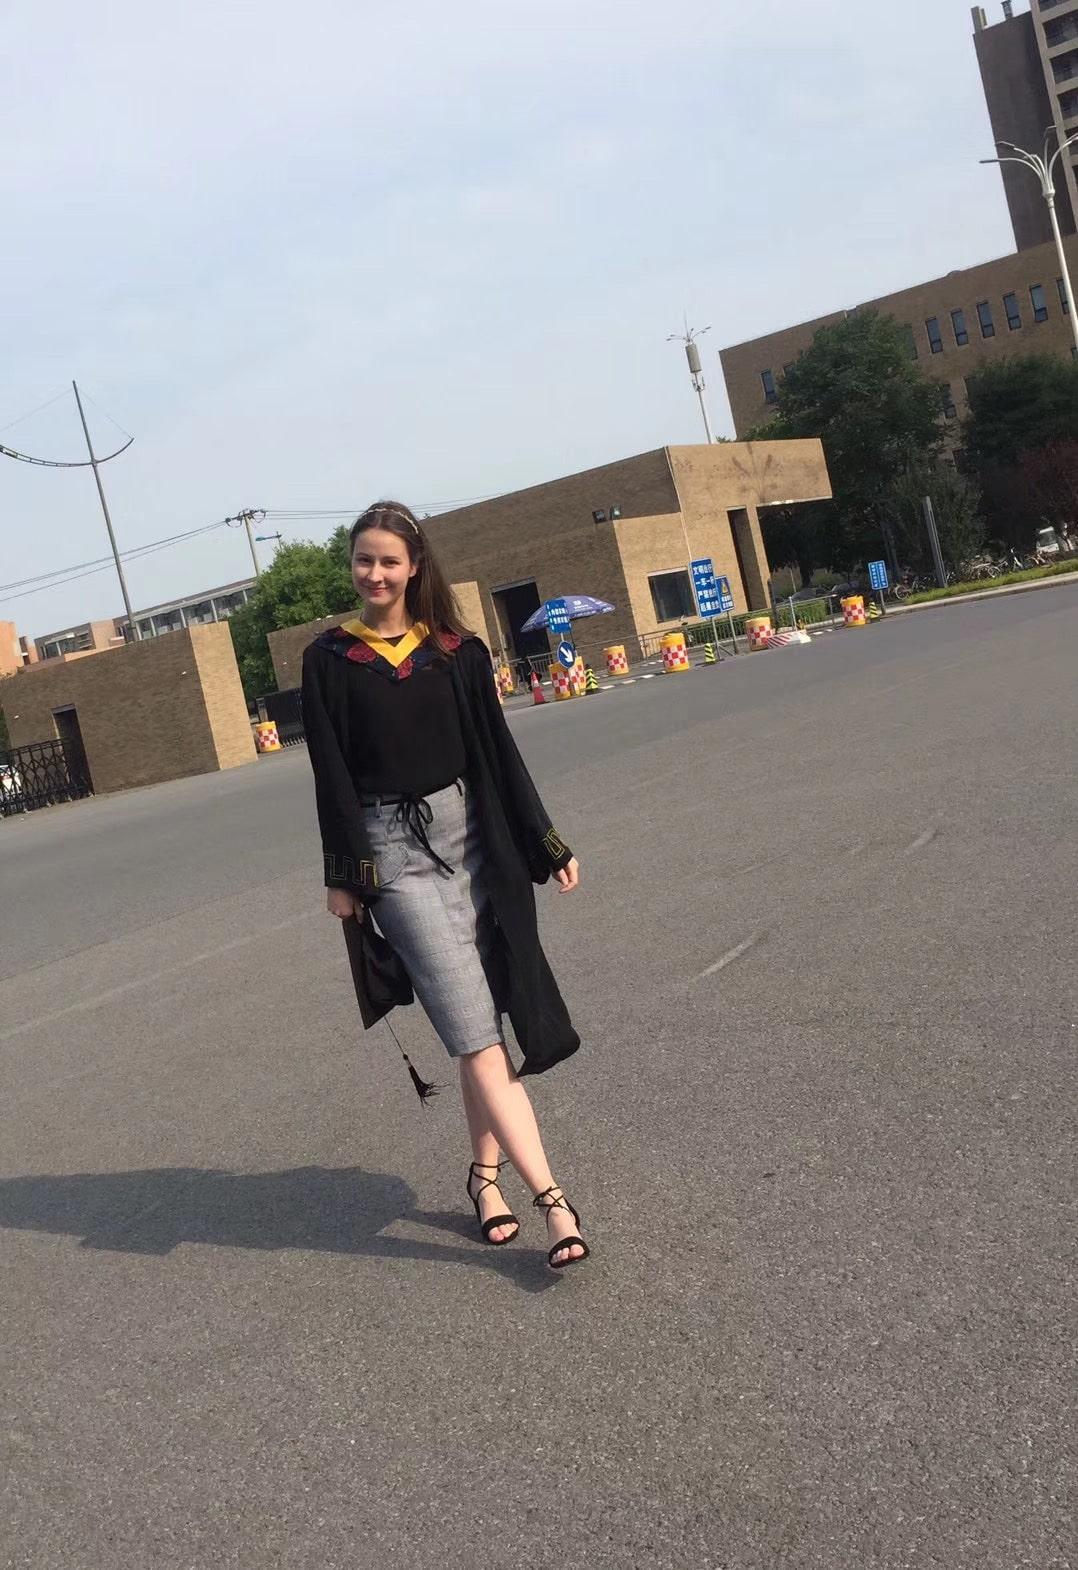 Johanna Pallmann walks towards the camera in a graduation robe